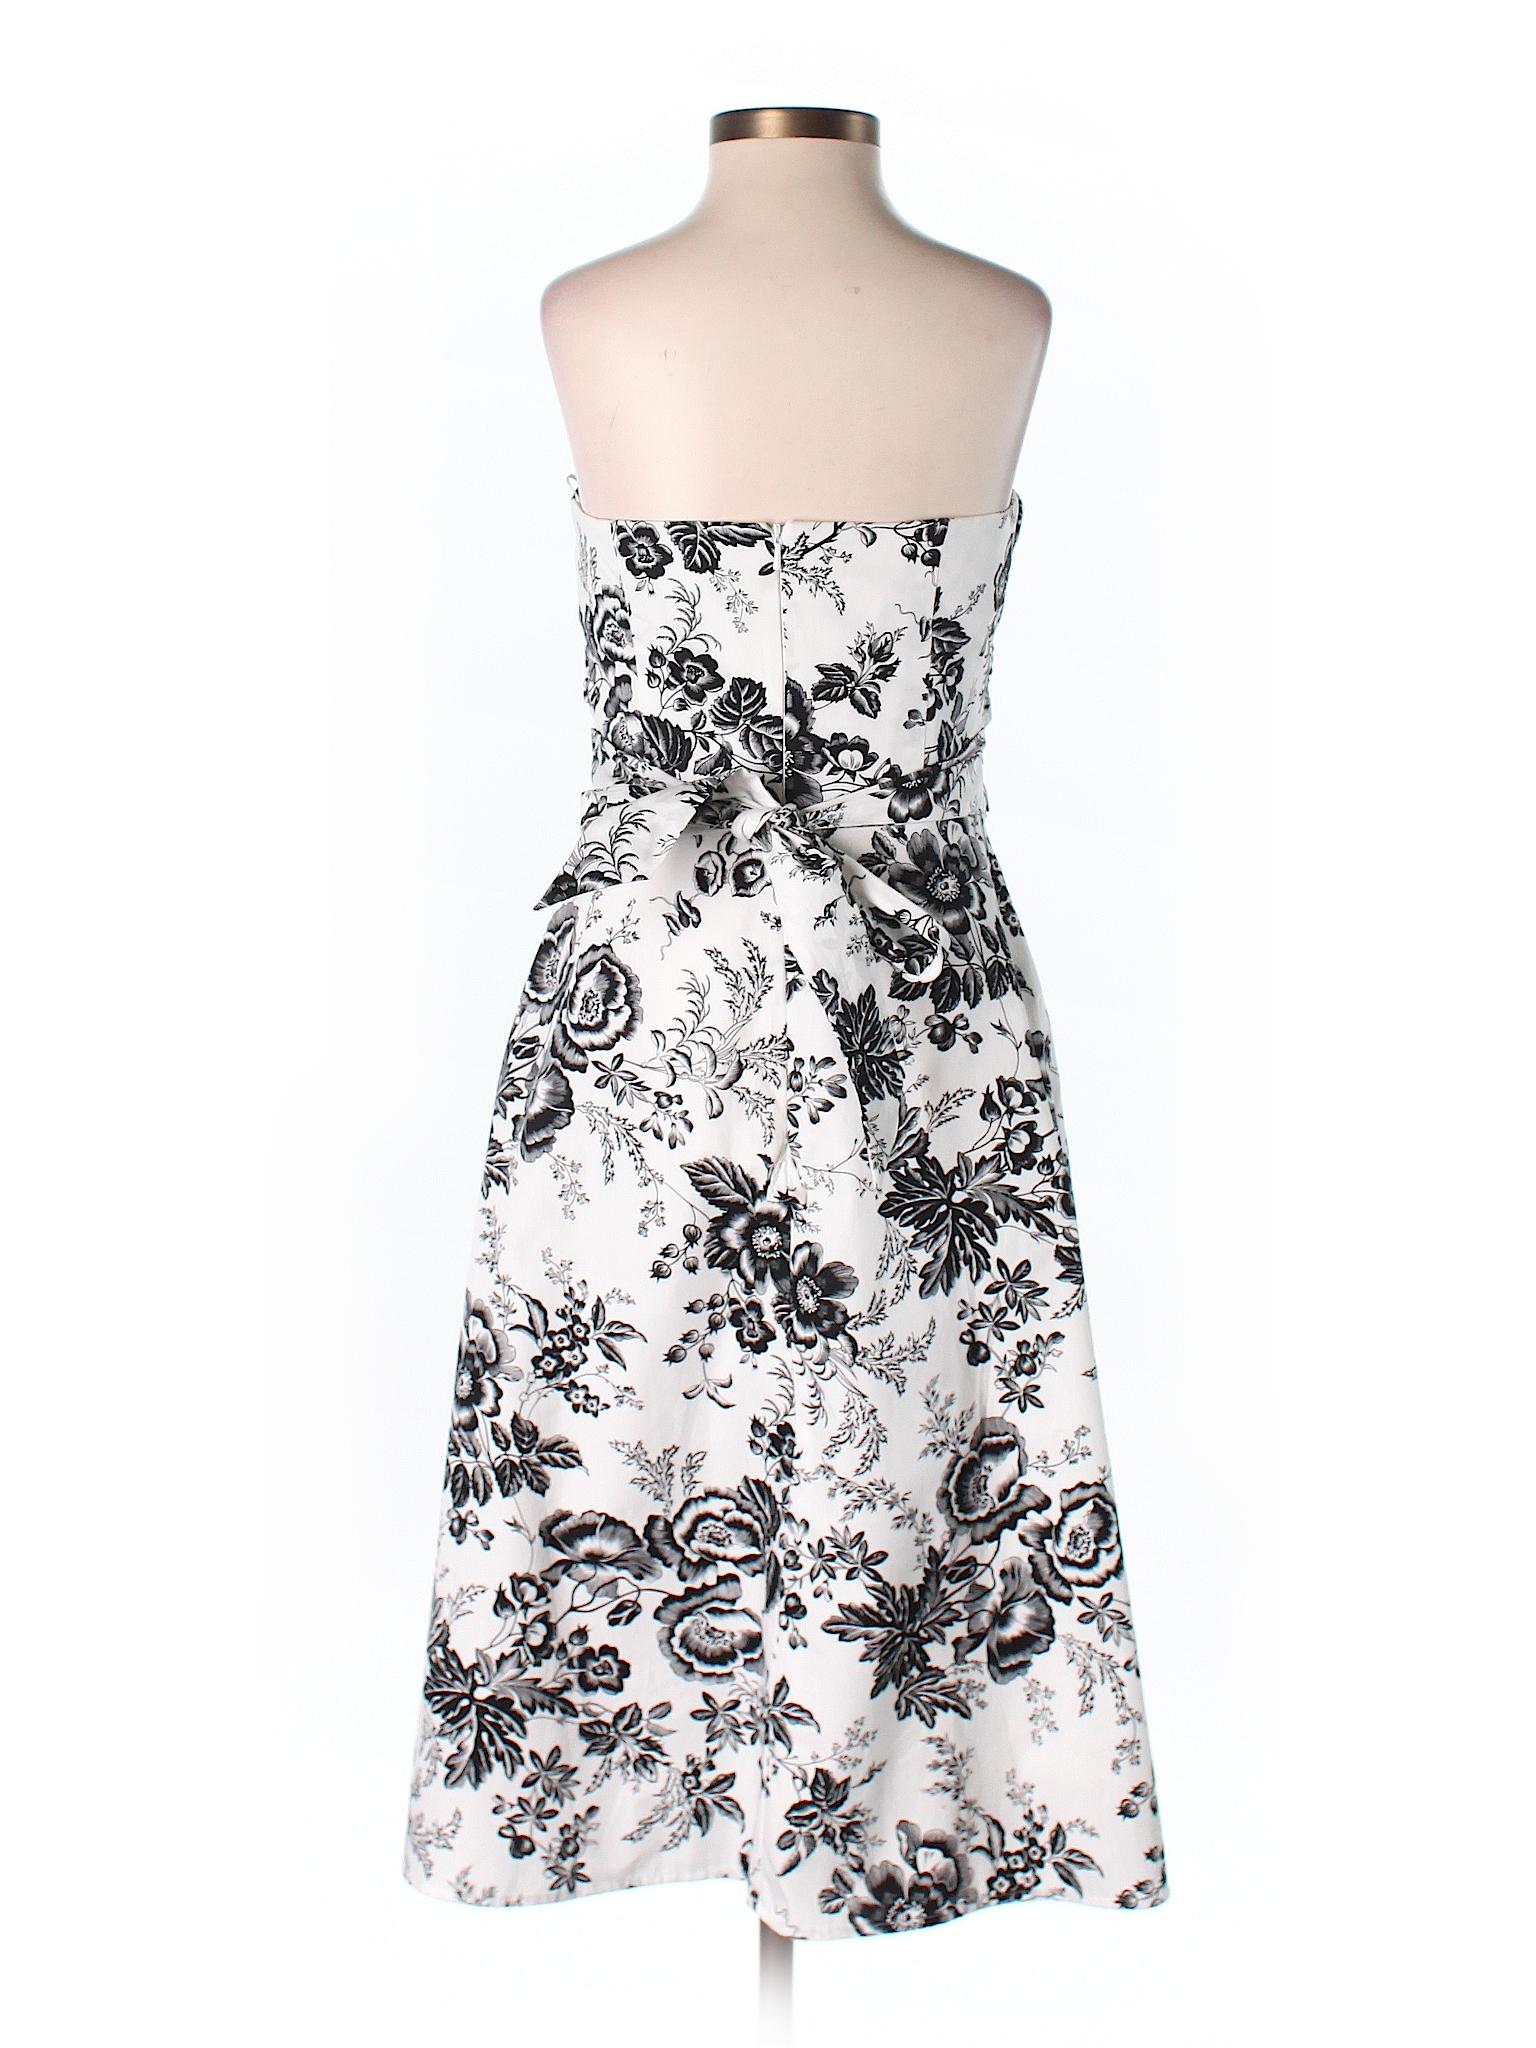 Market Dress White Selling Casual Black House 0q4UwZW6